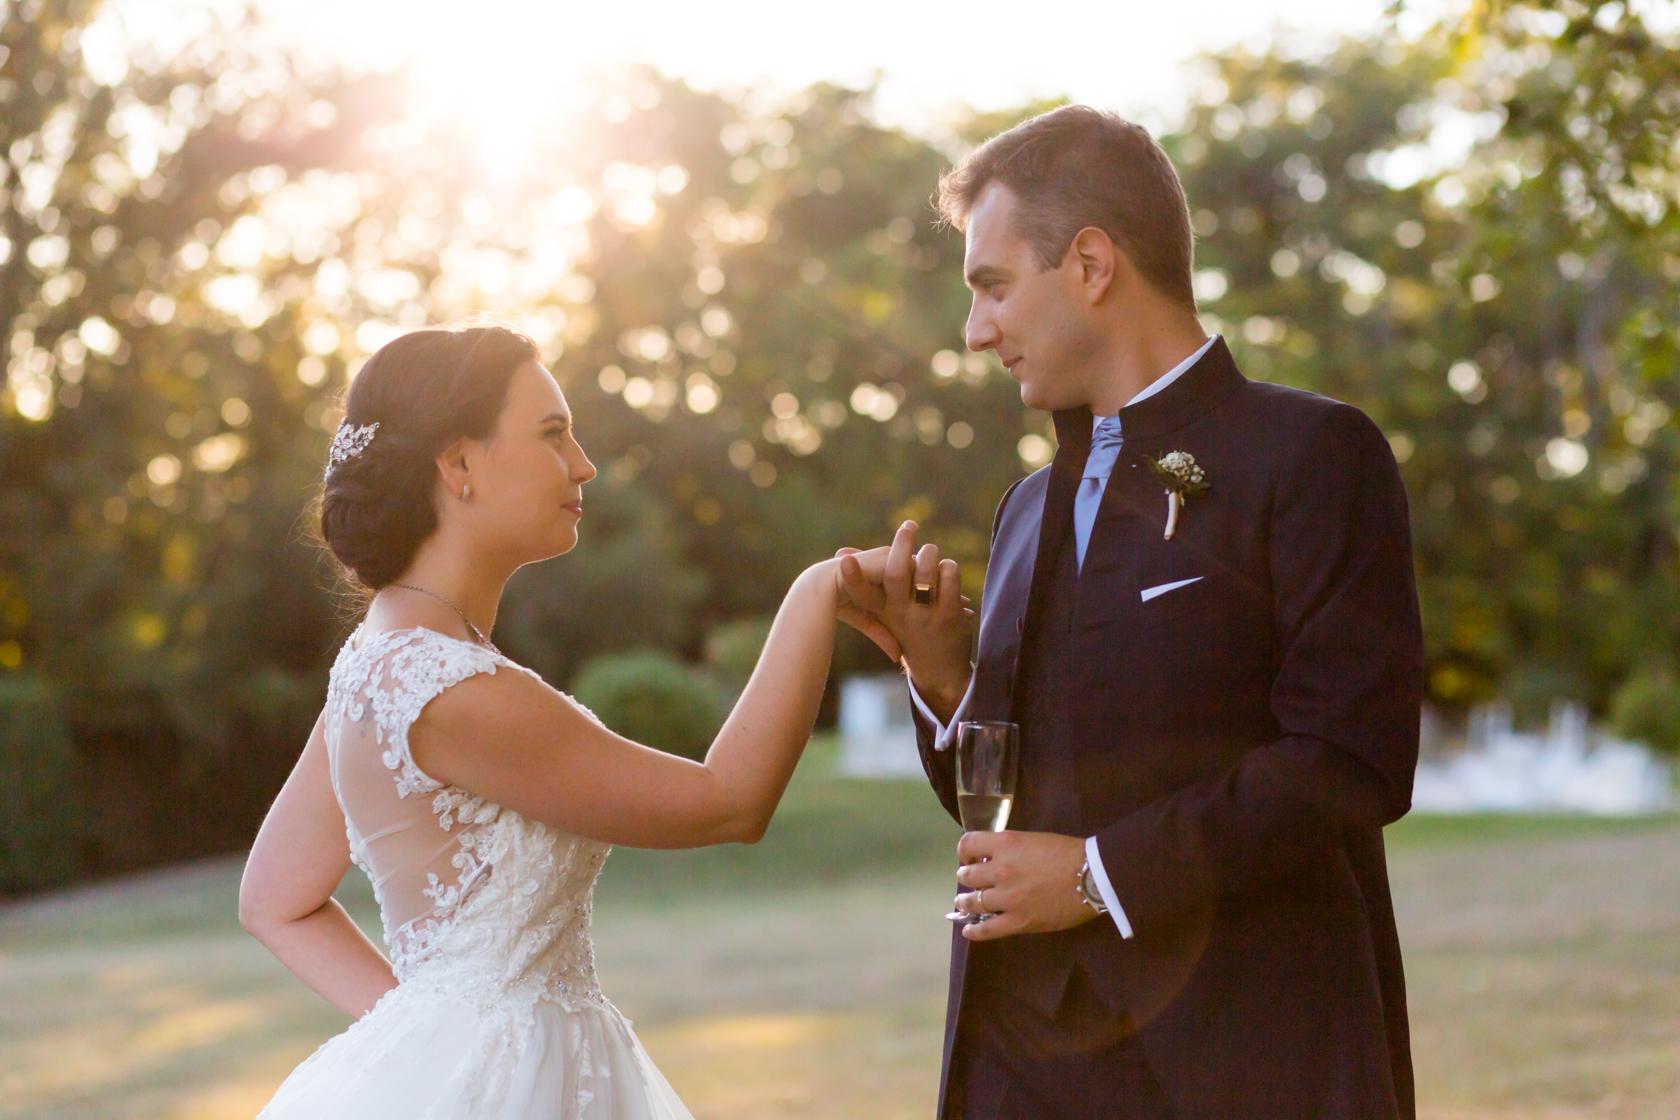 Séance couple mariage emotion